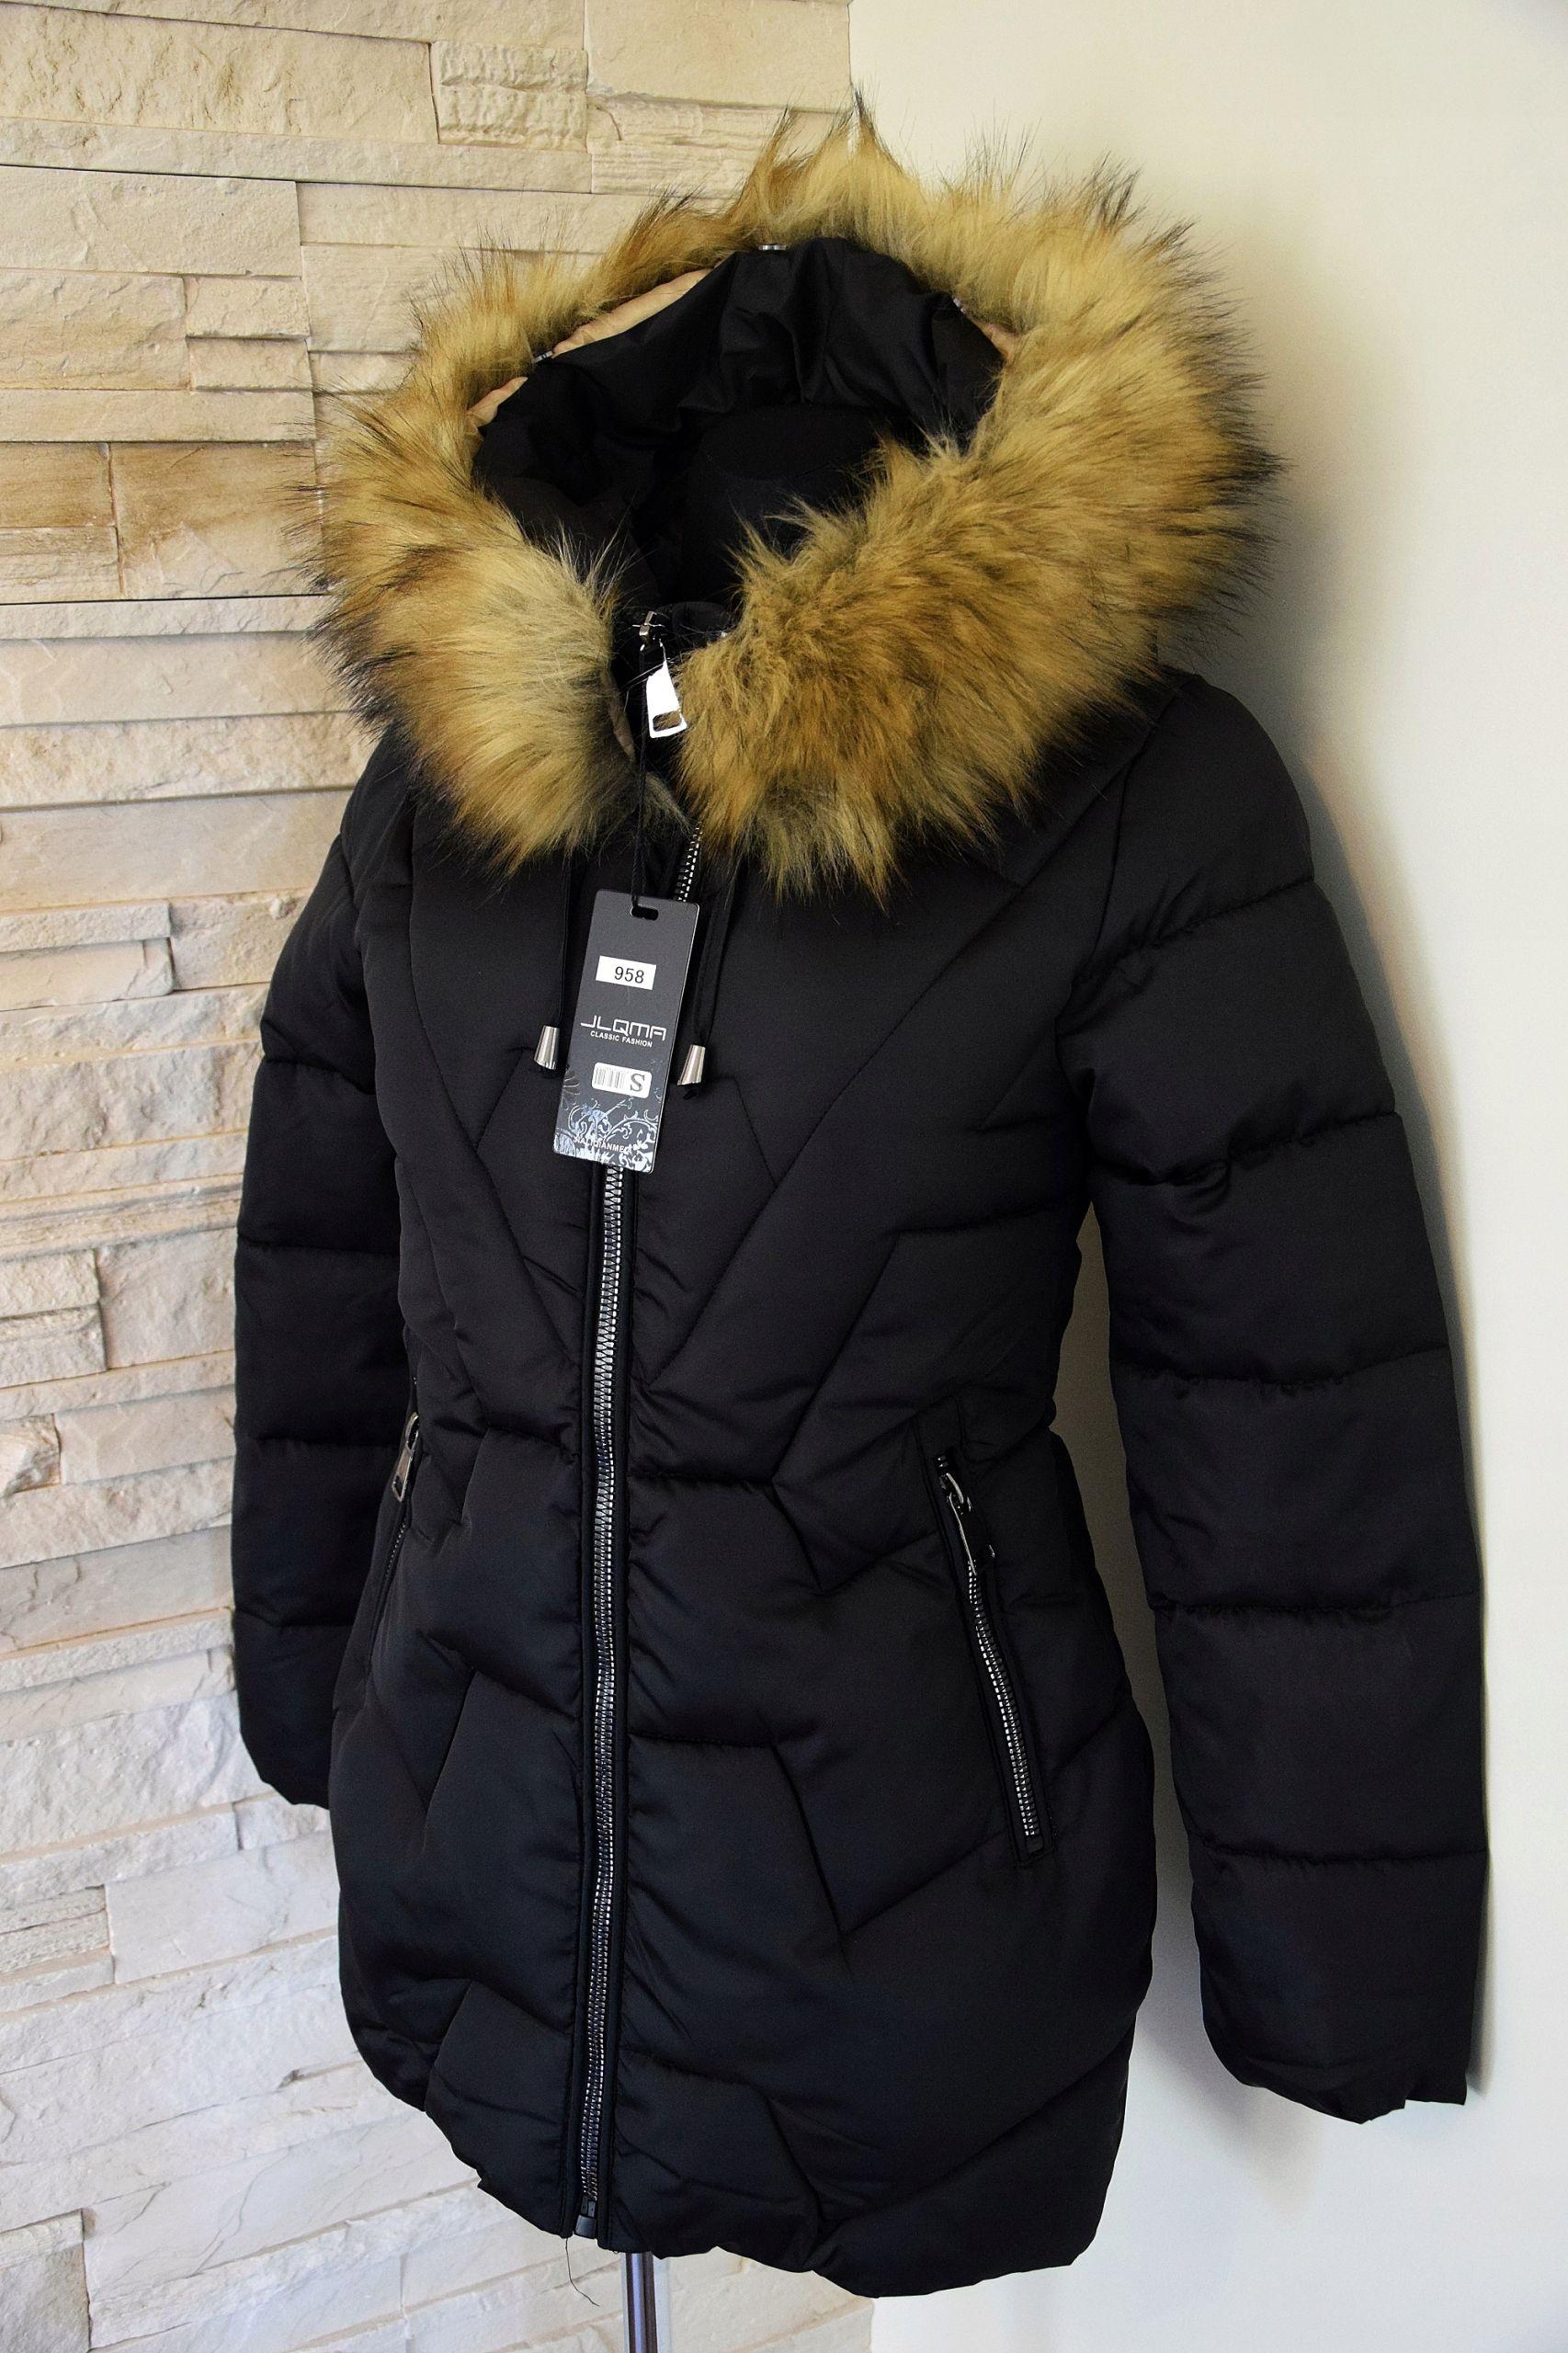 Zimowa Kurtka Pikowana Czarna Kaptur No R 4xl 8657611678 Allegro Pl Winter Jackets Jackets Fashion